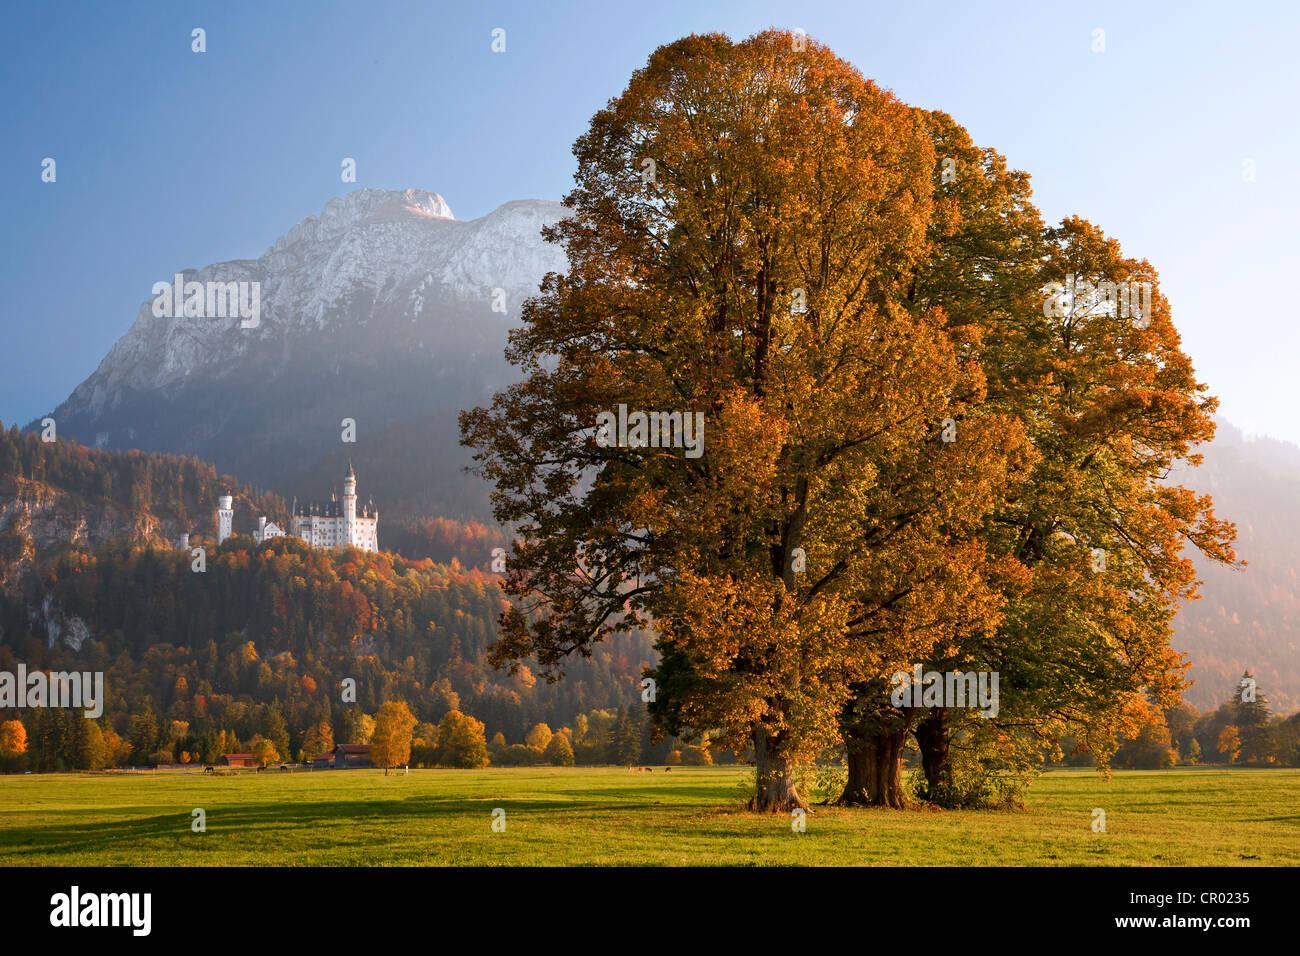 Autumn mood at Schloss Neuschwanstein castle in the evening light, Fuessen, Allgaeu, Bavaria, Germany, Europe - Stock Image